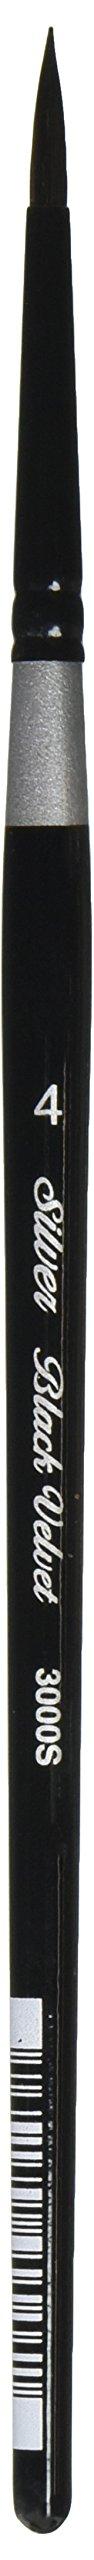 Silver Brush 3000S-4 Black Velvet Short Handle Blend Squirrel and Risslon Brush, Round, Size 4